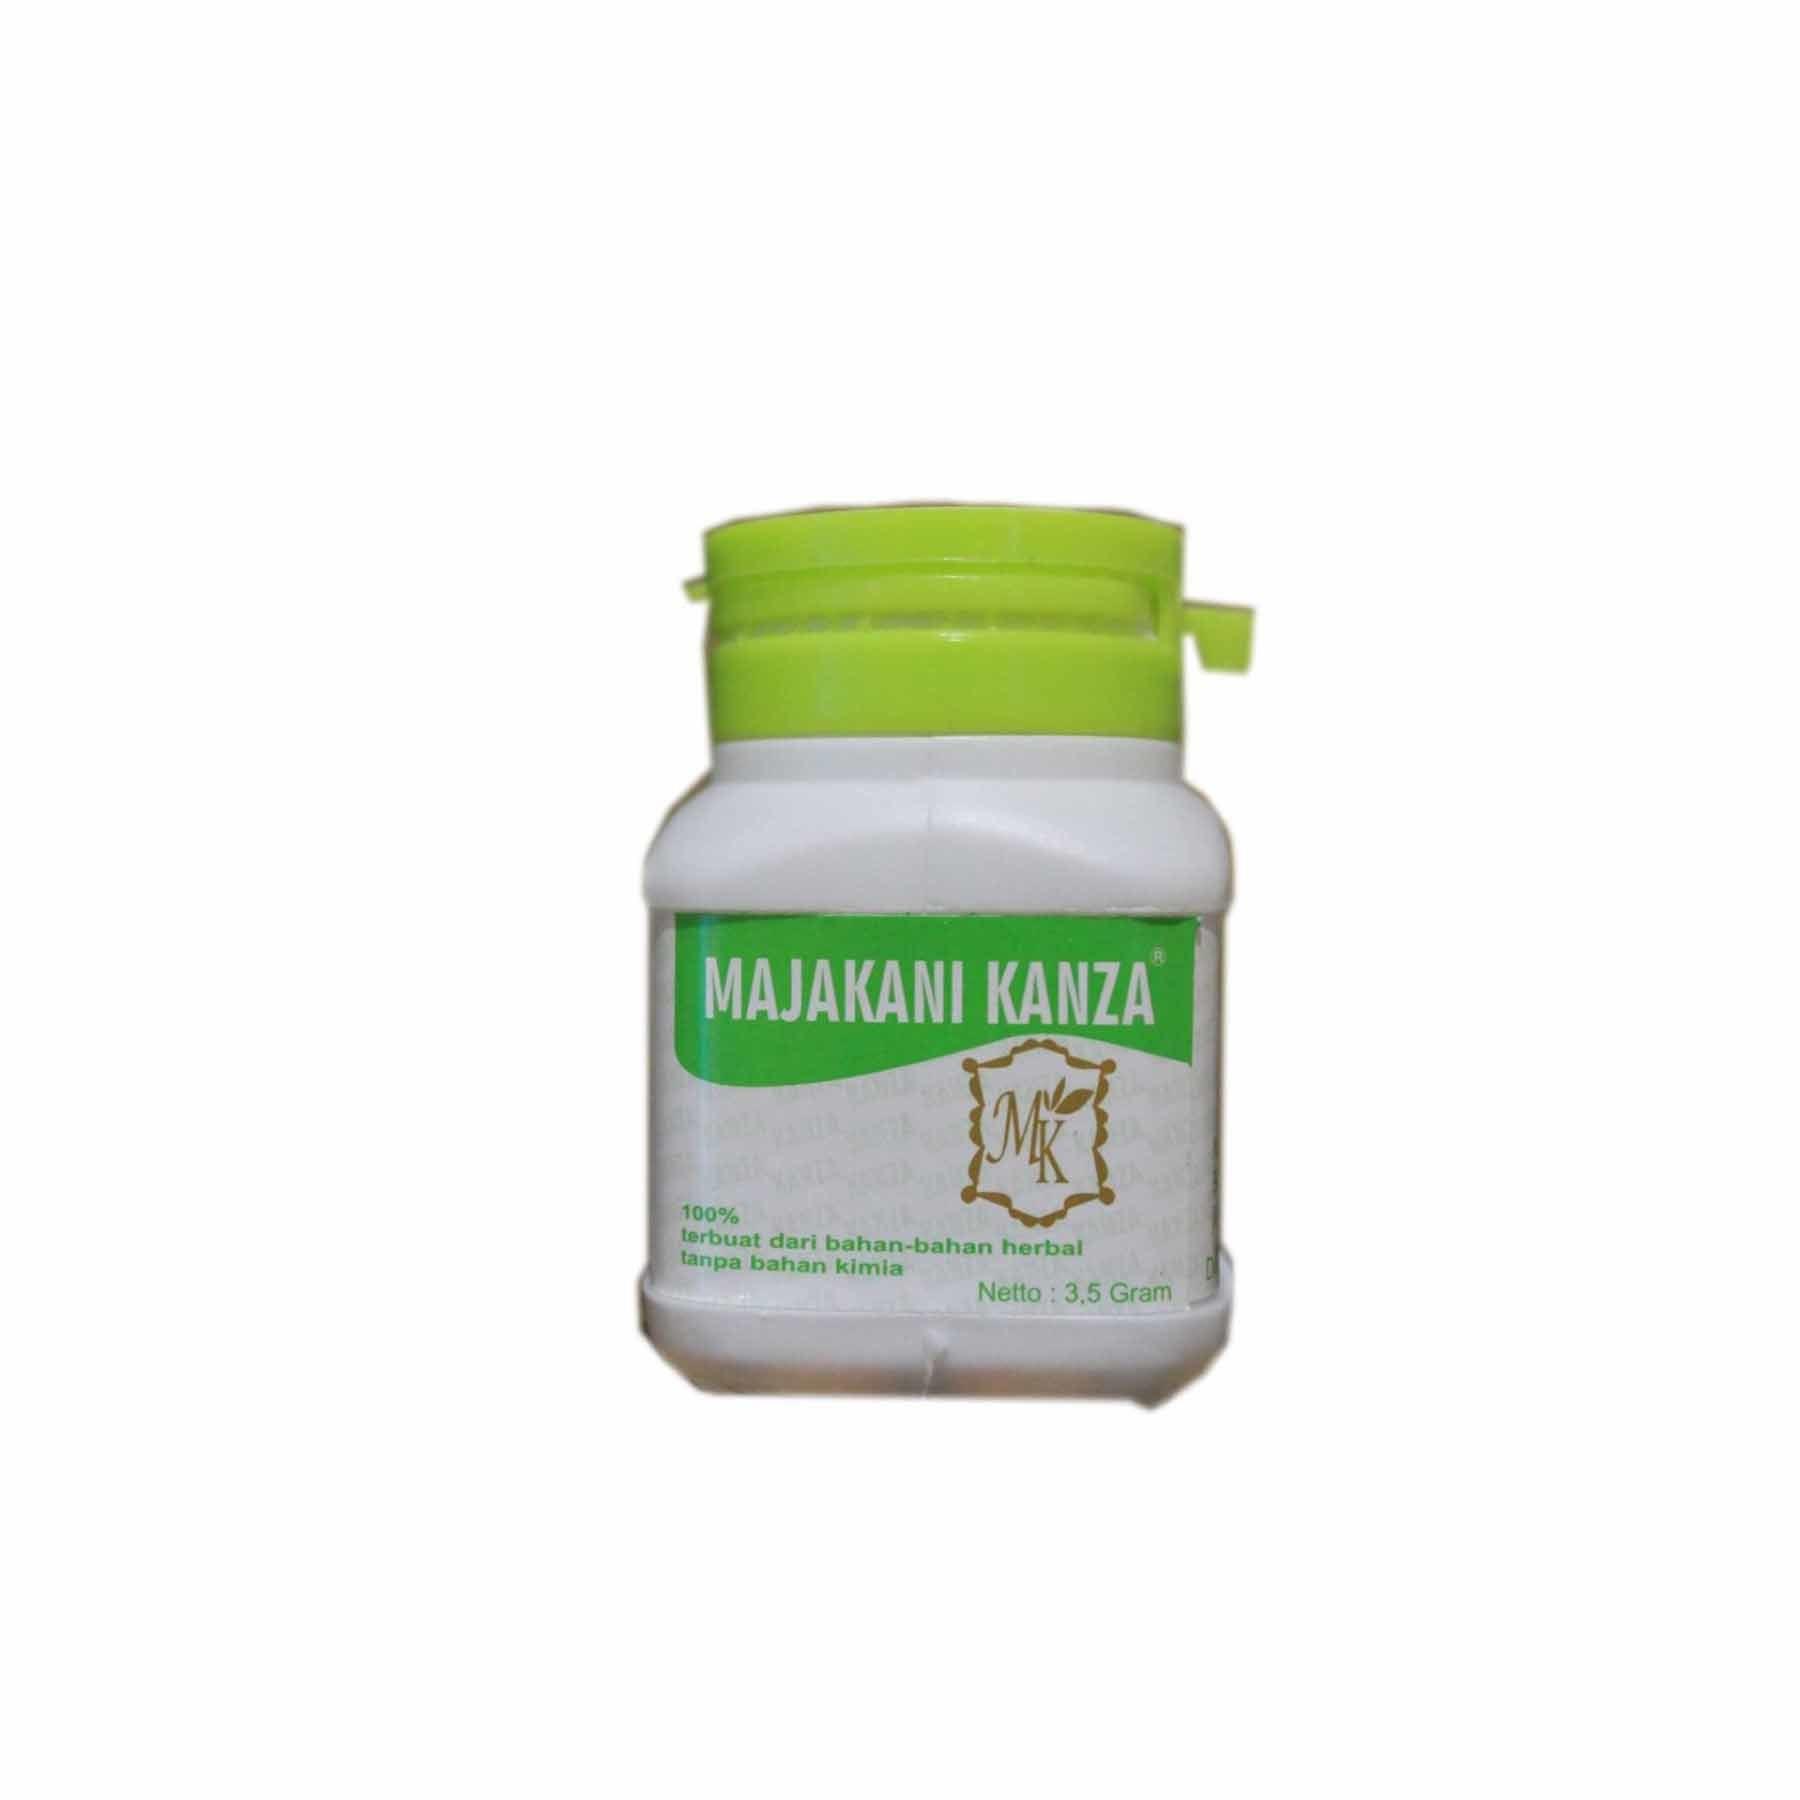 Herbal Ben Rapat Kapsul Majakani Manjakani Kanza Daftar Update Aceh Situs Review Source Buy Sell Cheapest